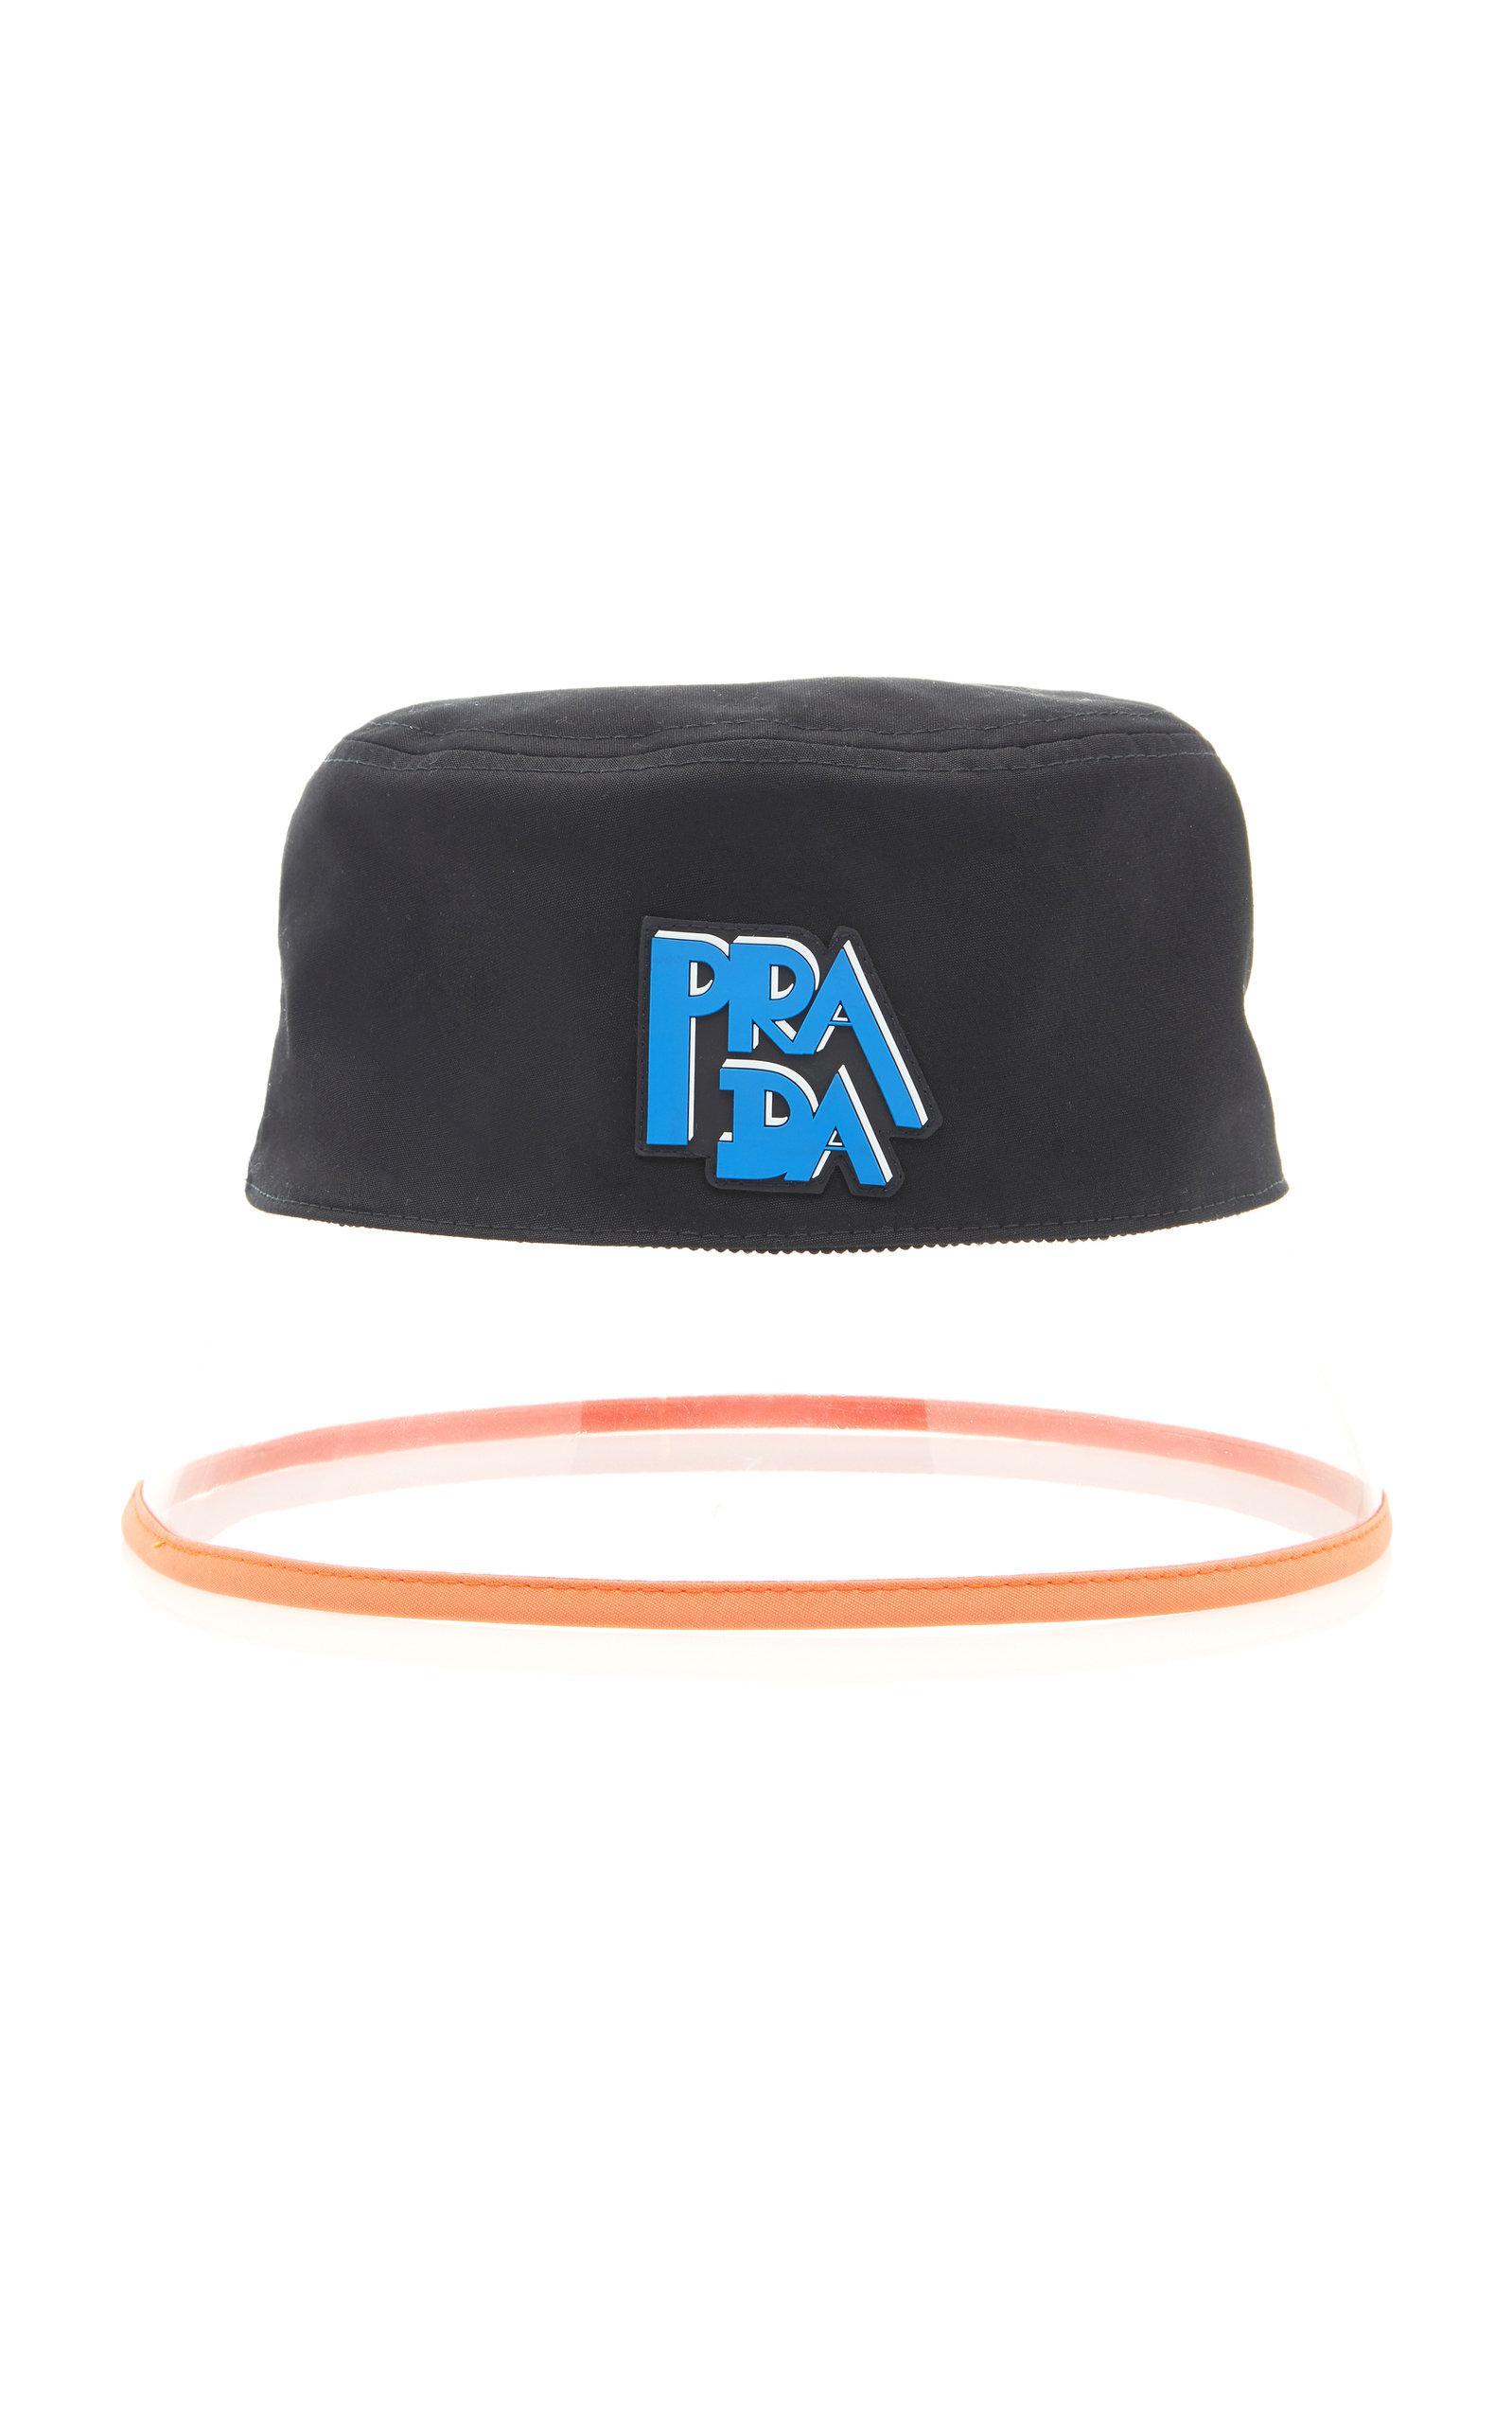 d0233adba3fc0 Prada Popeline Bucket Hat In Black